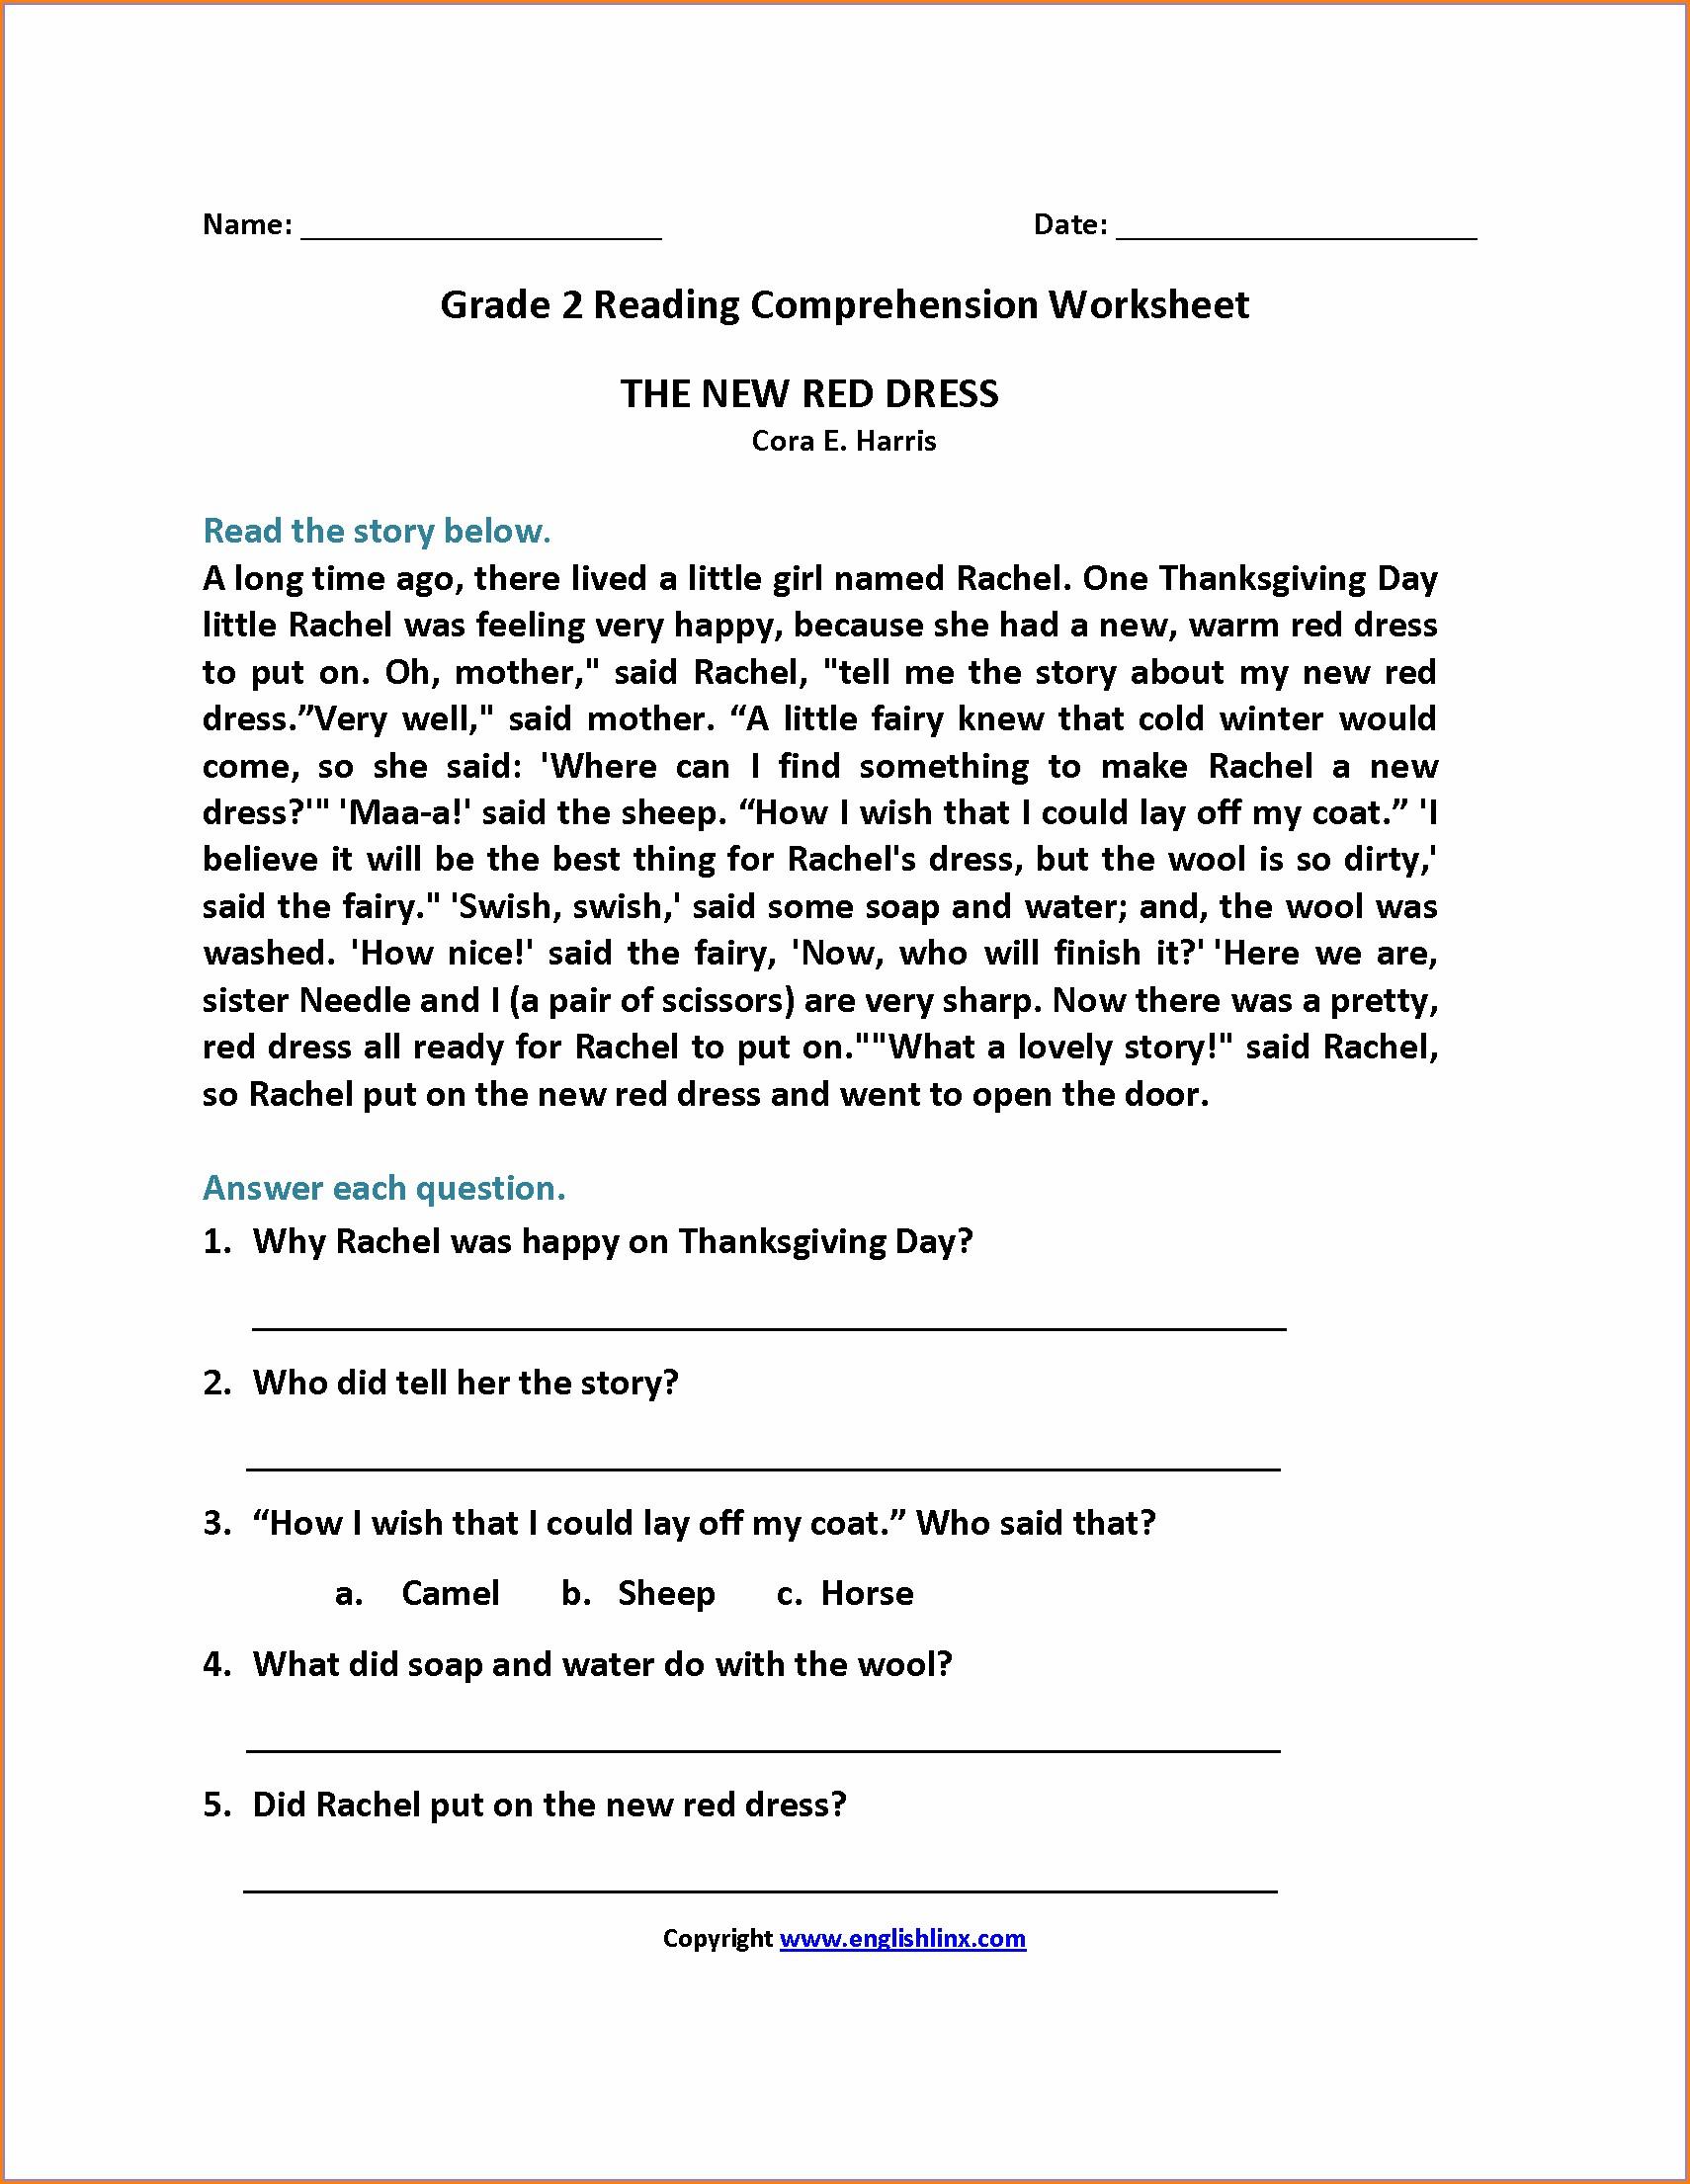 Worksheet In Filipino Grade 2